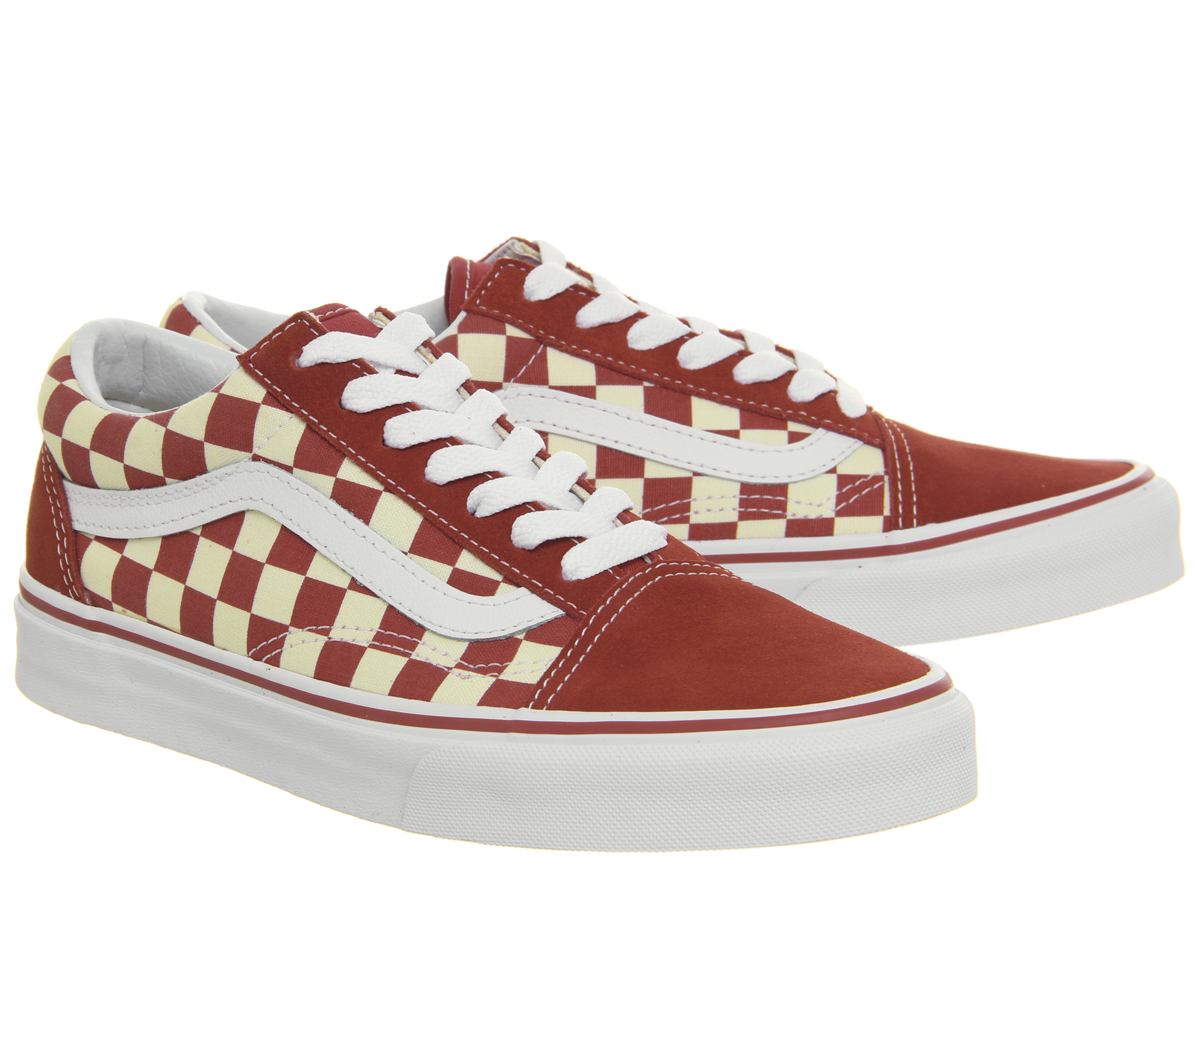 Da Uomo Vans Old Skool Sneaker Scarpe Da Ginnastica Da Corsa Rosso Classico Bianco a Scacchiera Scarpe Da Ginnastica Scarpa